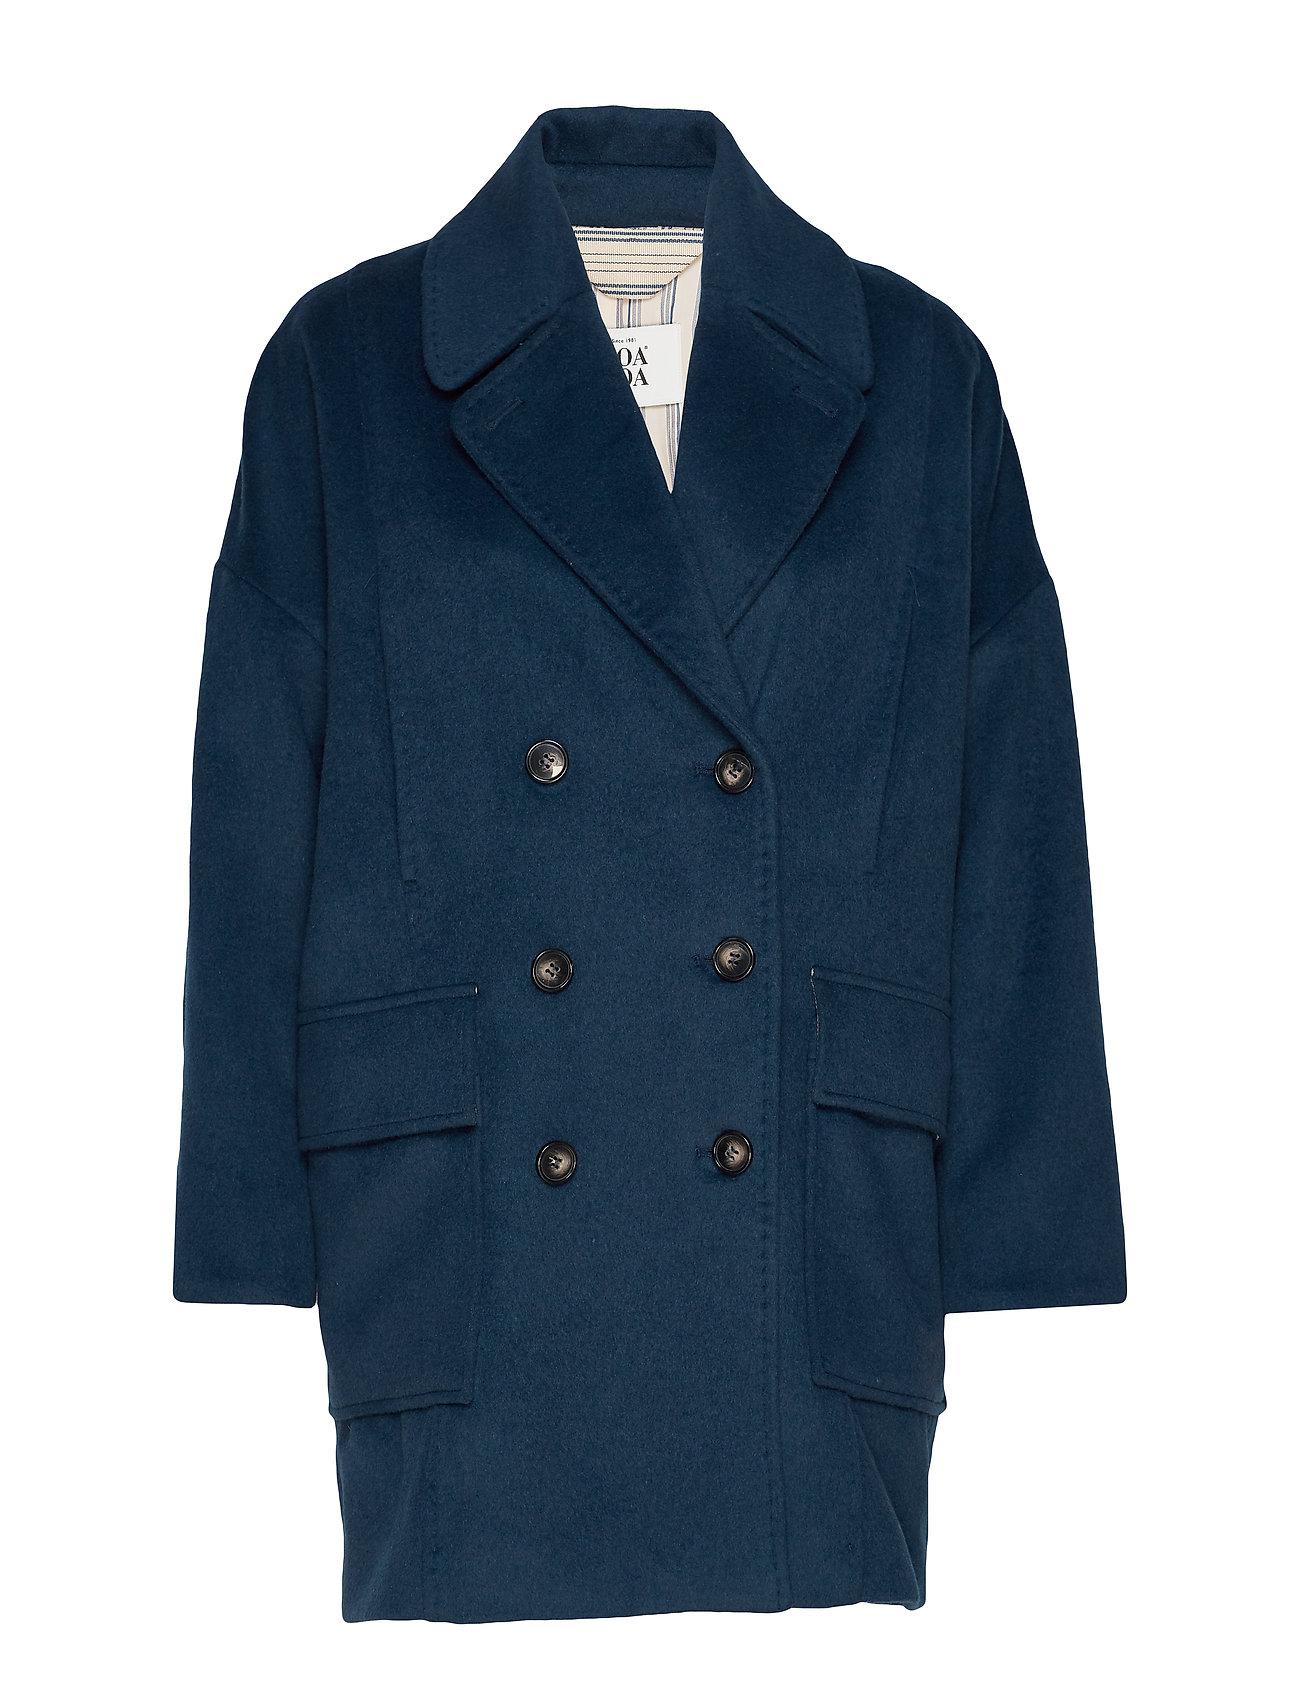 Noa Noa Heavy outerwear - DRESS BLUES